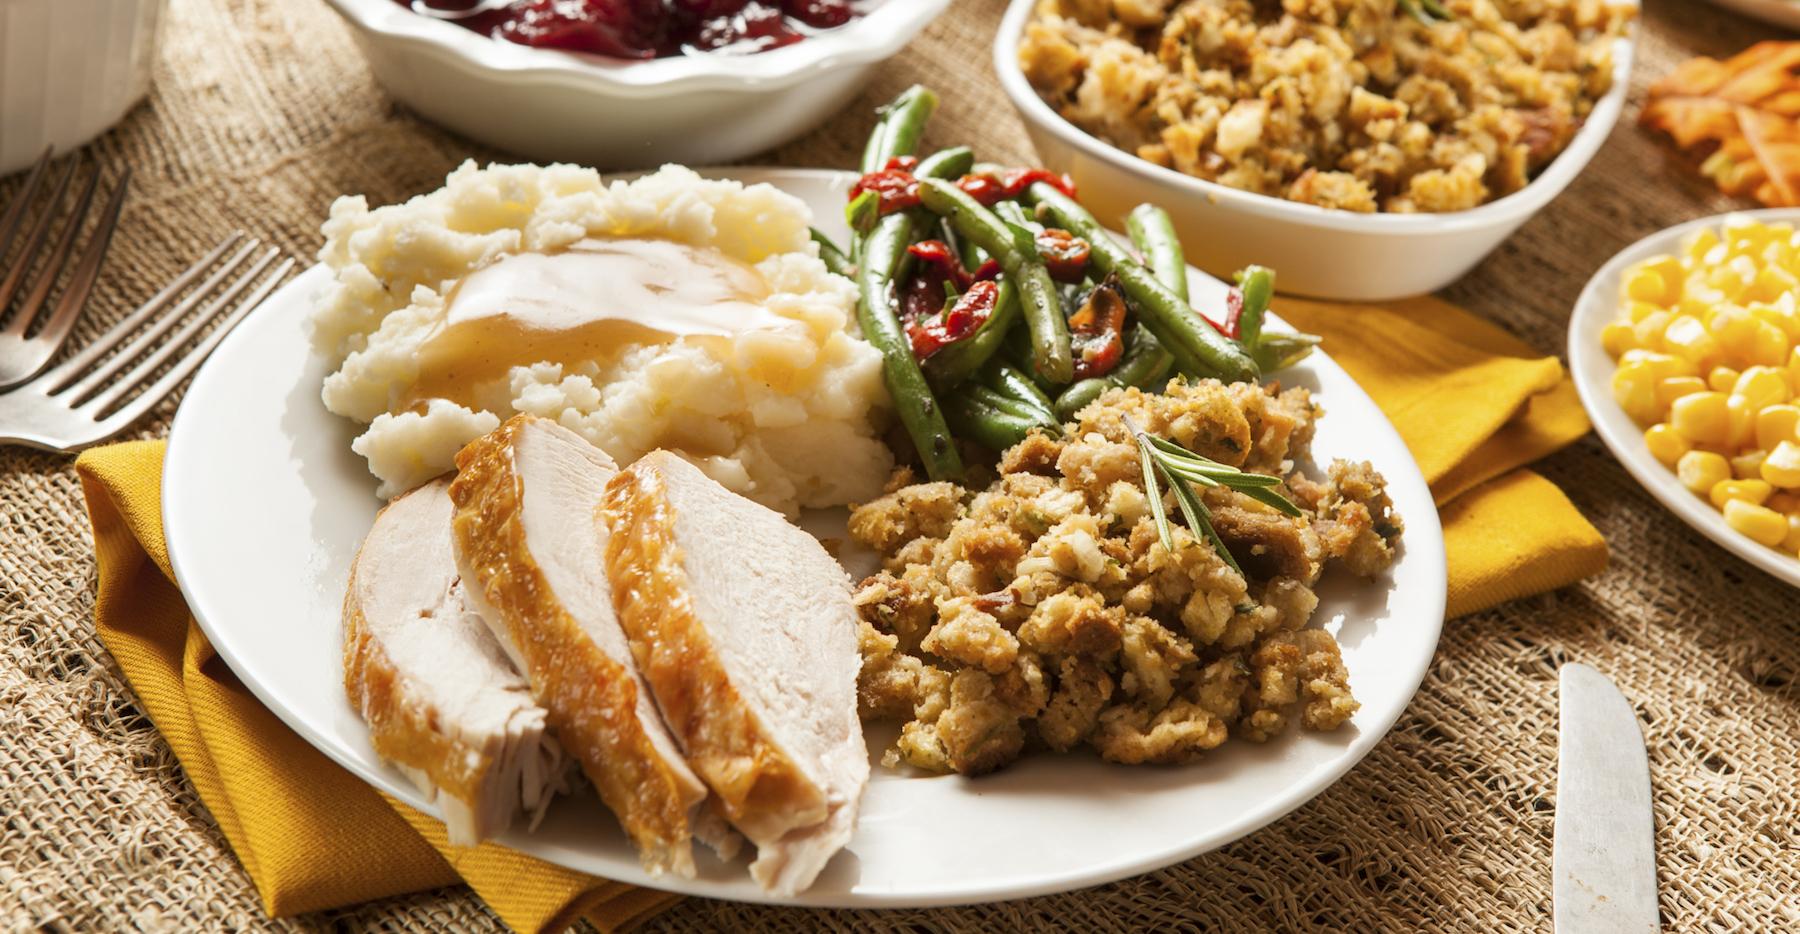 photo Thanksgiving Dinner: 5 Easy Ways to SaveCalories